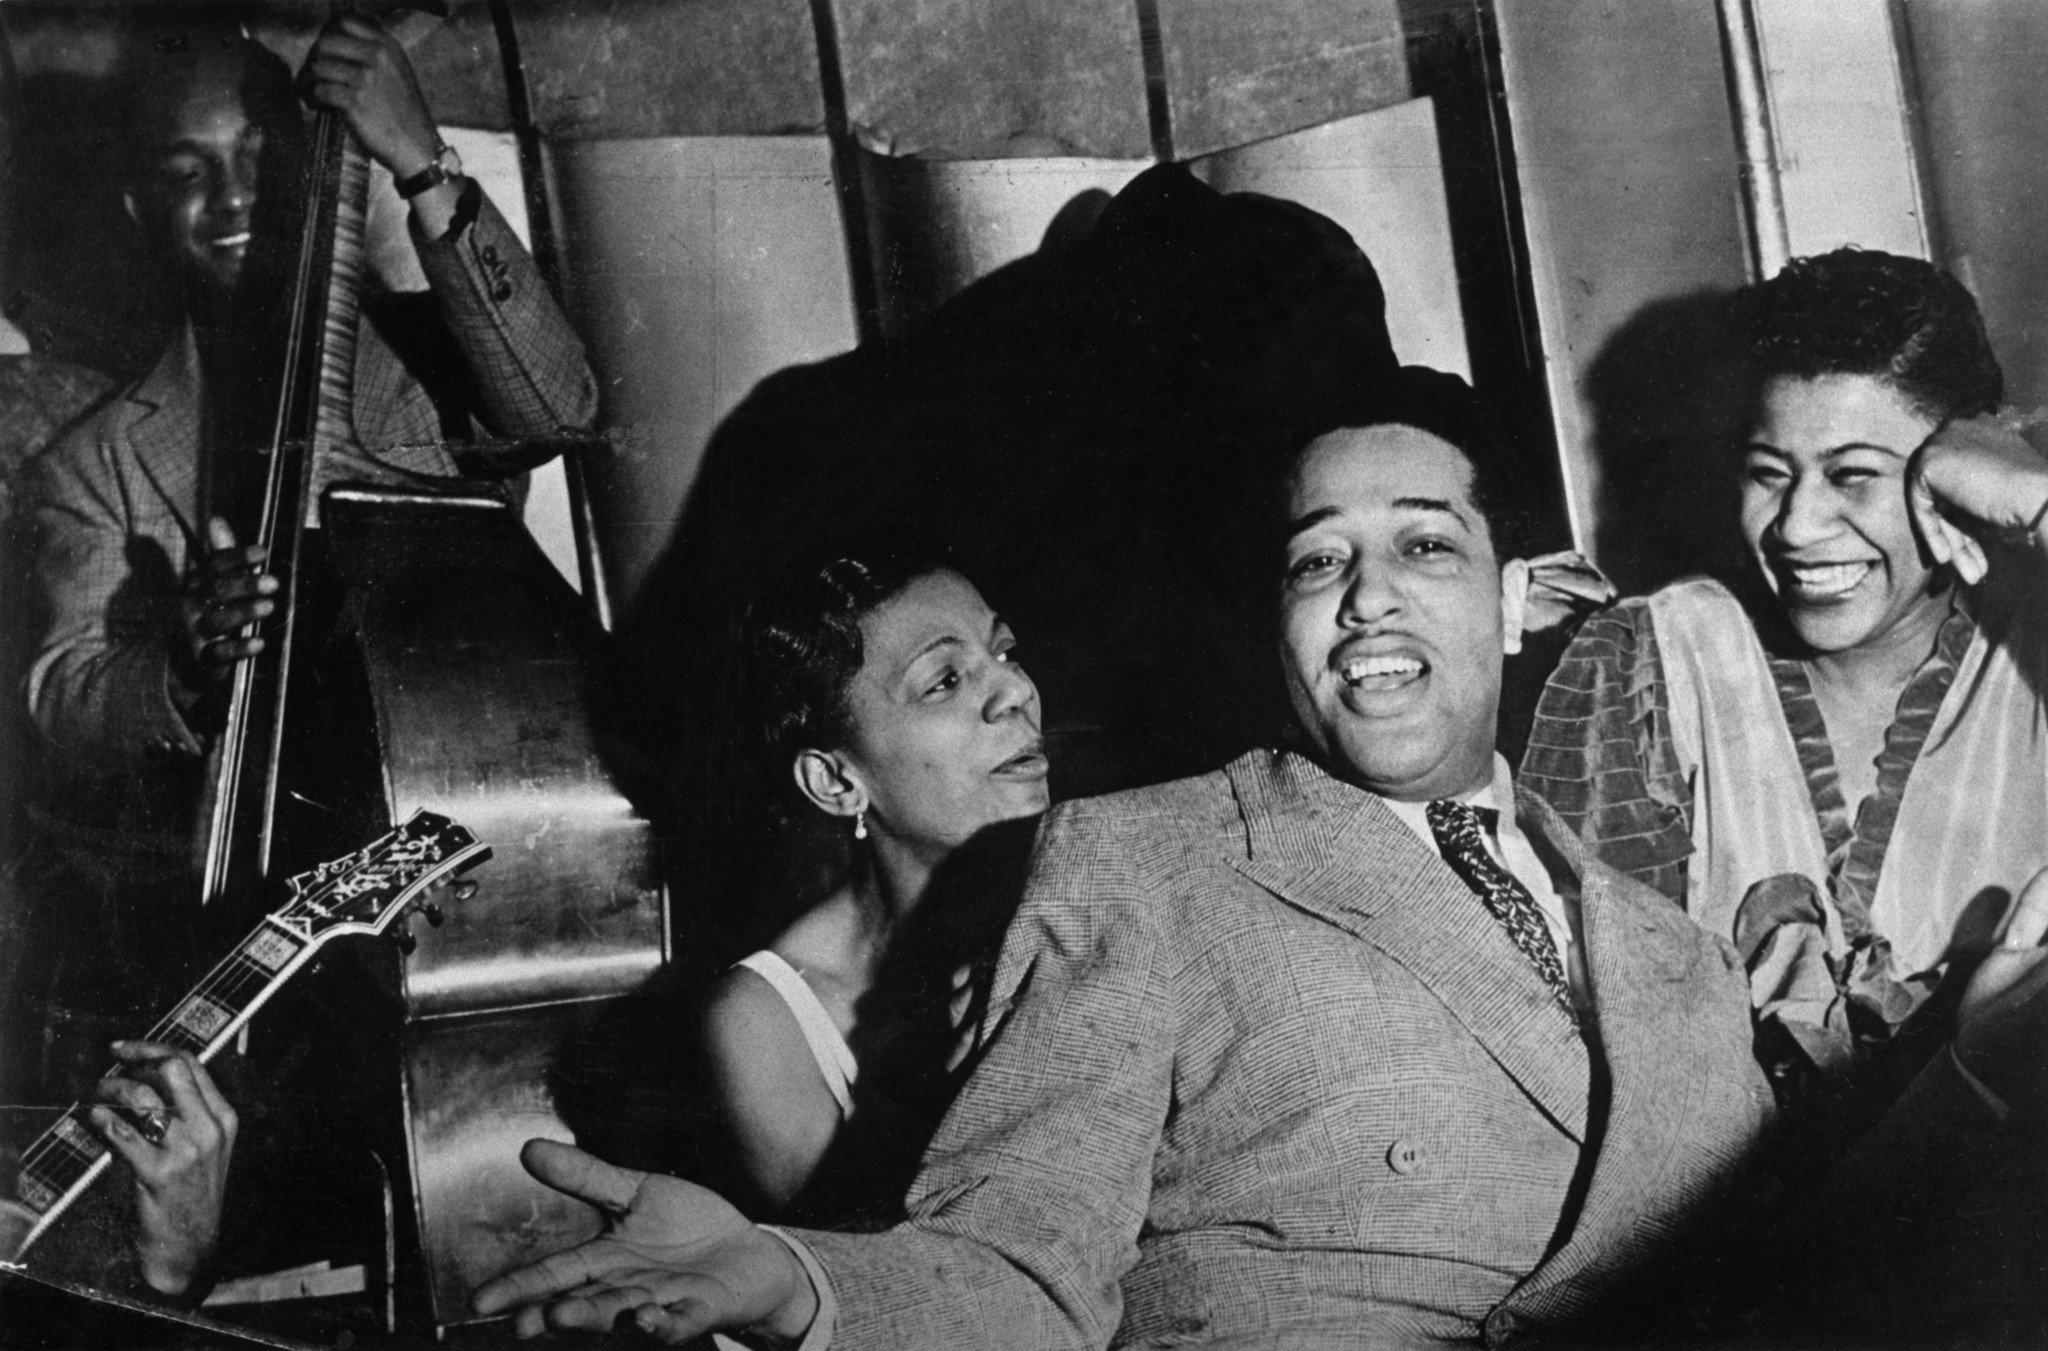 1938 – Hayes Alvis, Ivie Anderson, Duke Ellington & Ella Fitzgerald on the Savoy Ballroom bandstand. Source: F. Driggs Collection, Magnum Photos (Reference PAR59937)